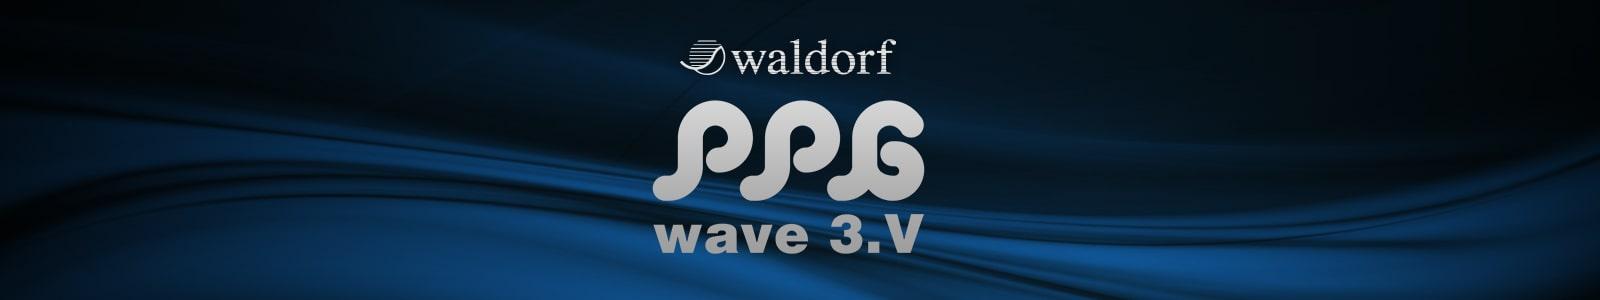 largo by waldorf